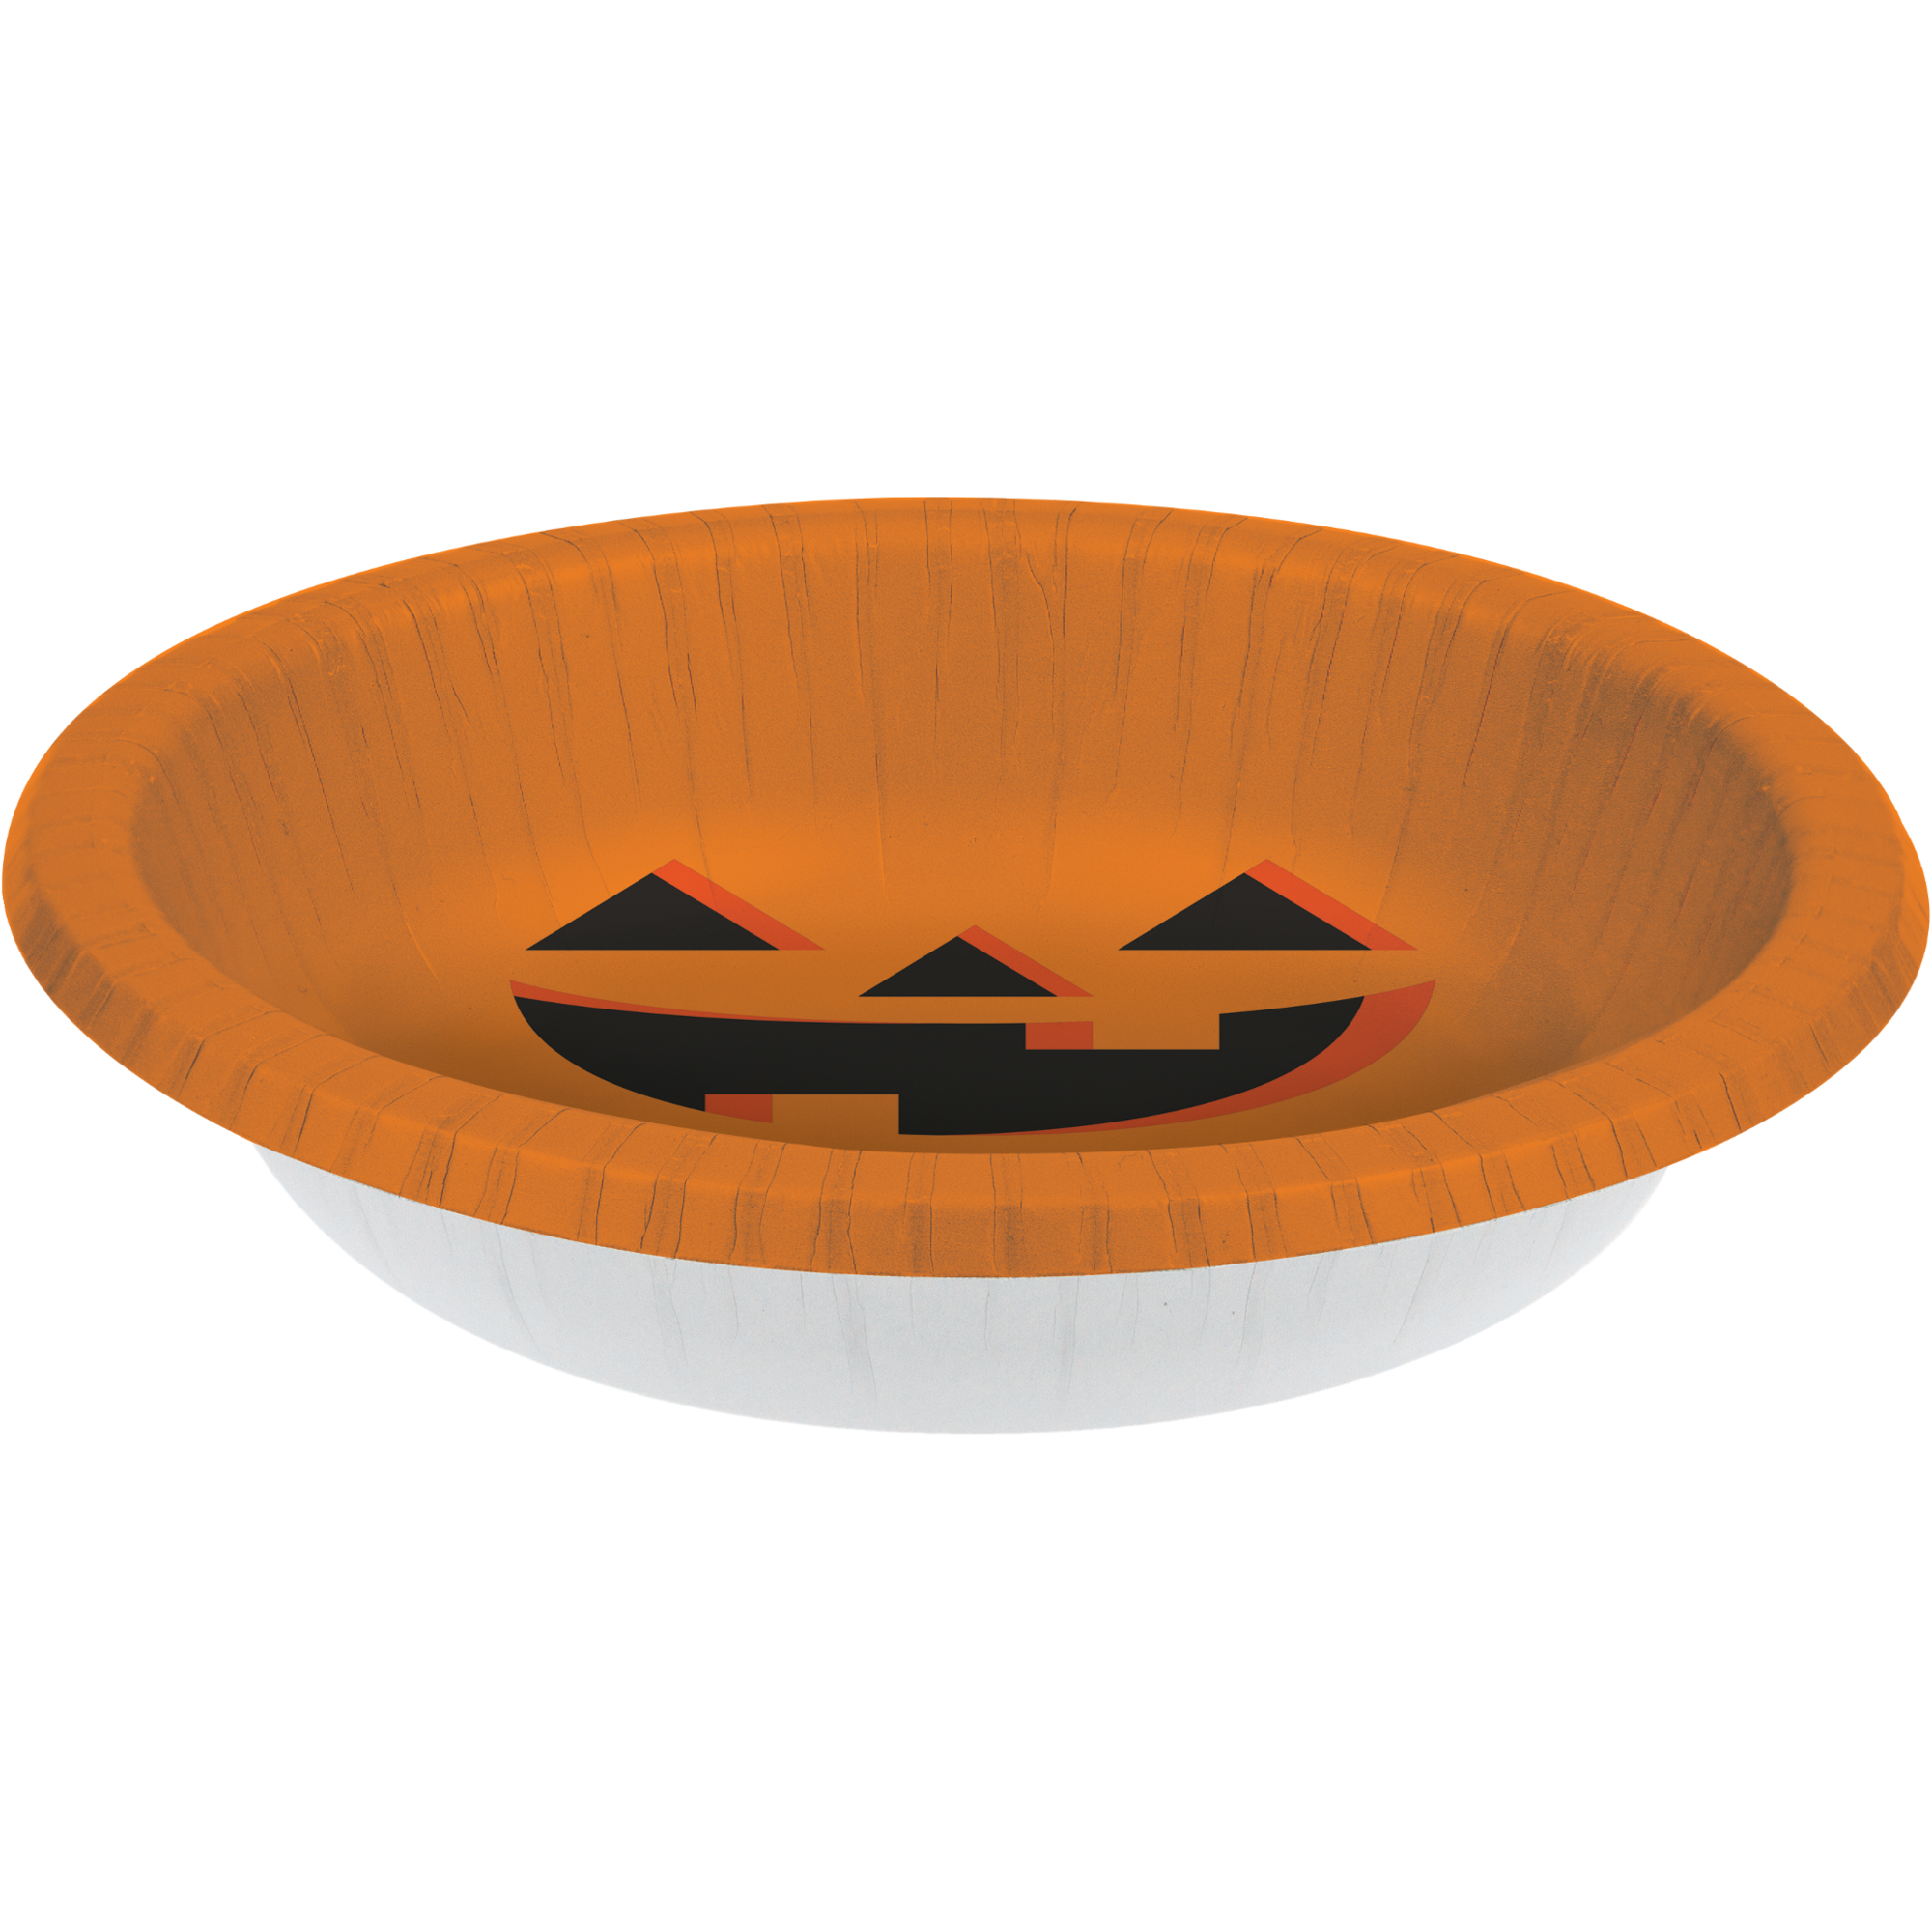 Pumpkin bowl clipart banner freeuse download 96/case) Halloween Pumpkin 20Oz. Paper Bowl - Party Secret banner freeuse download